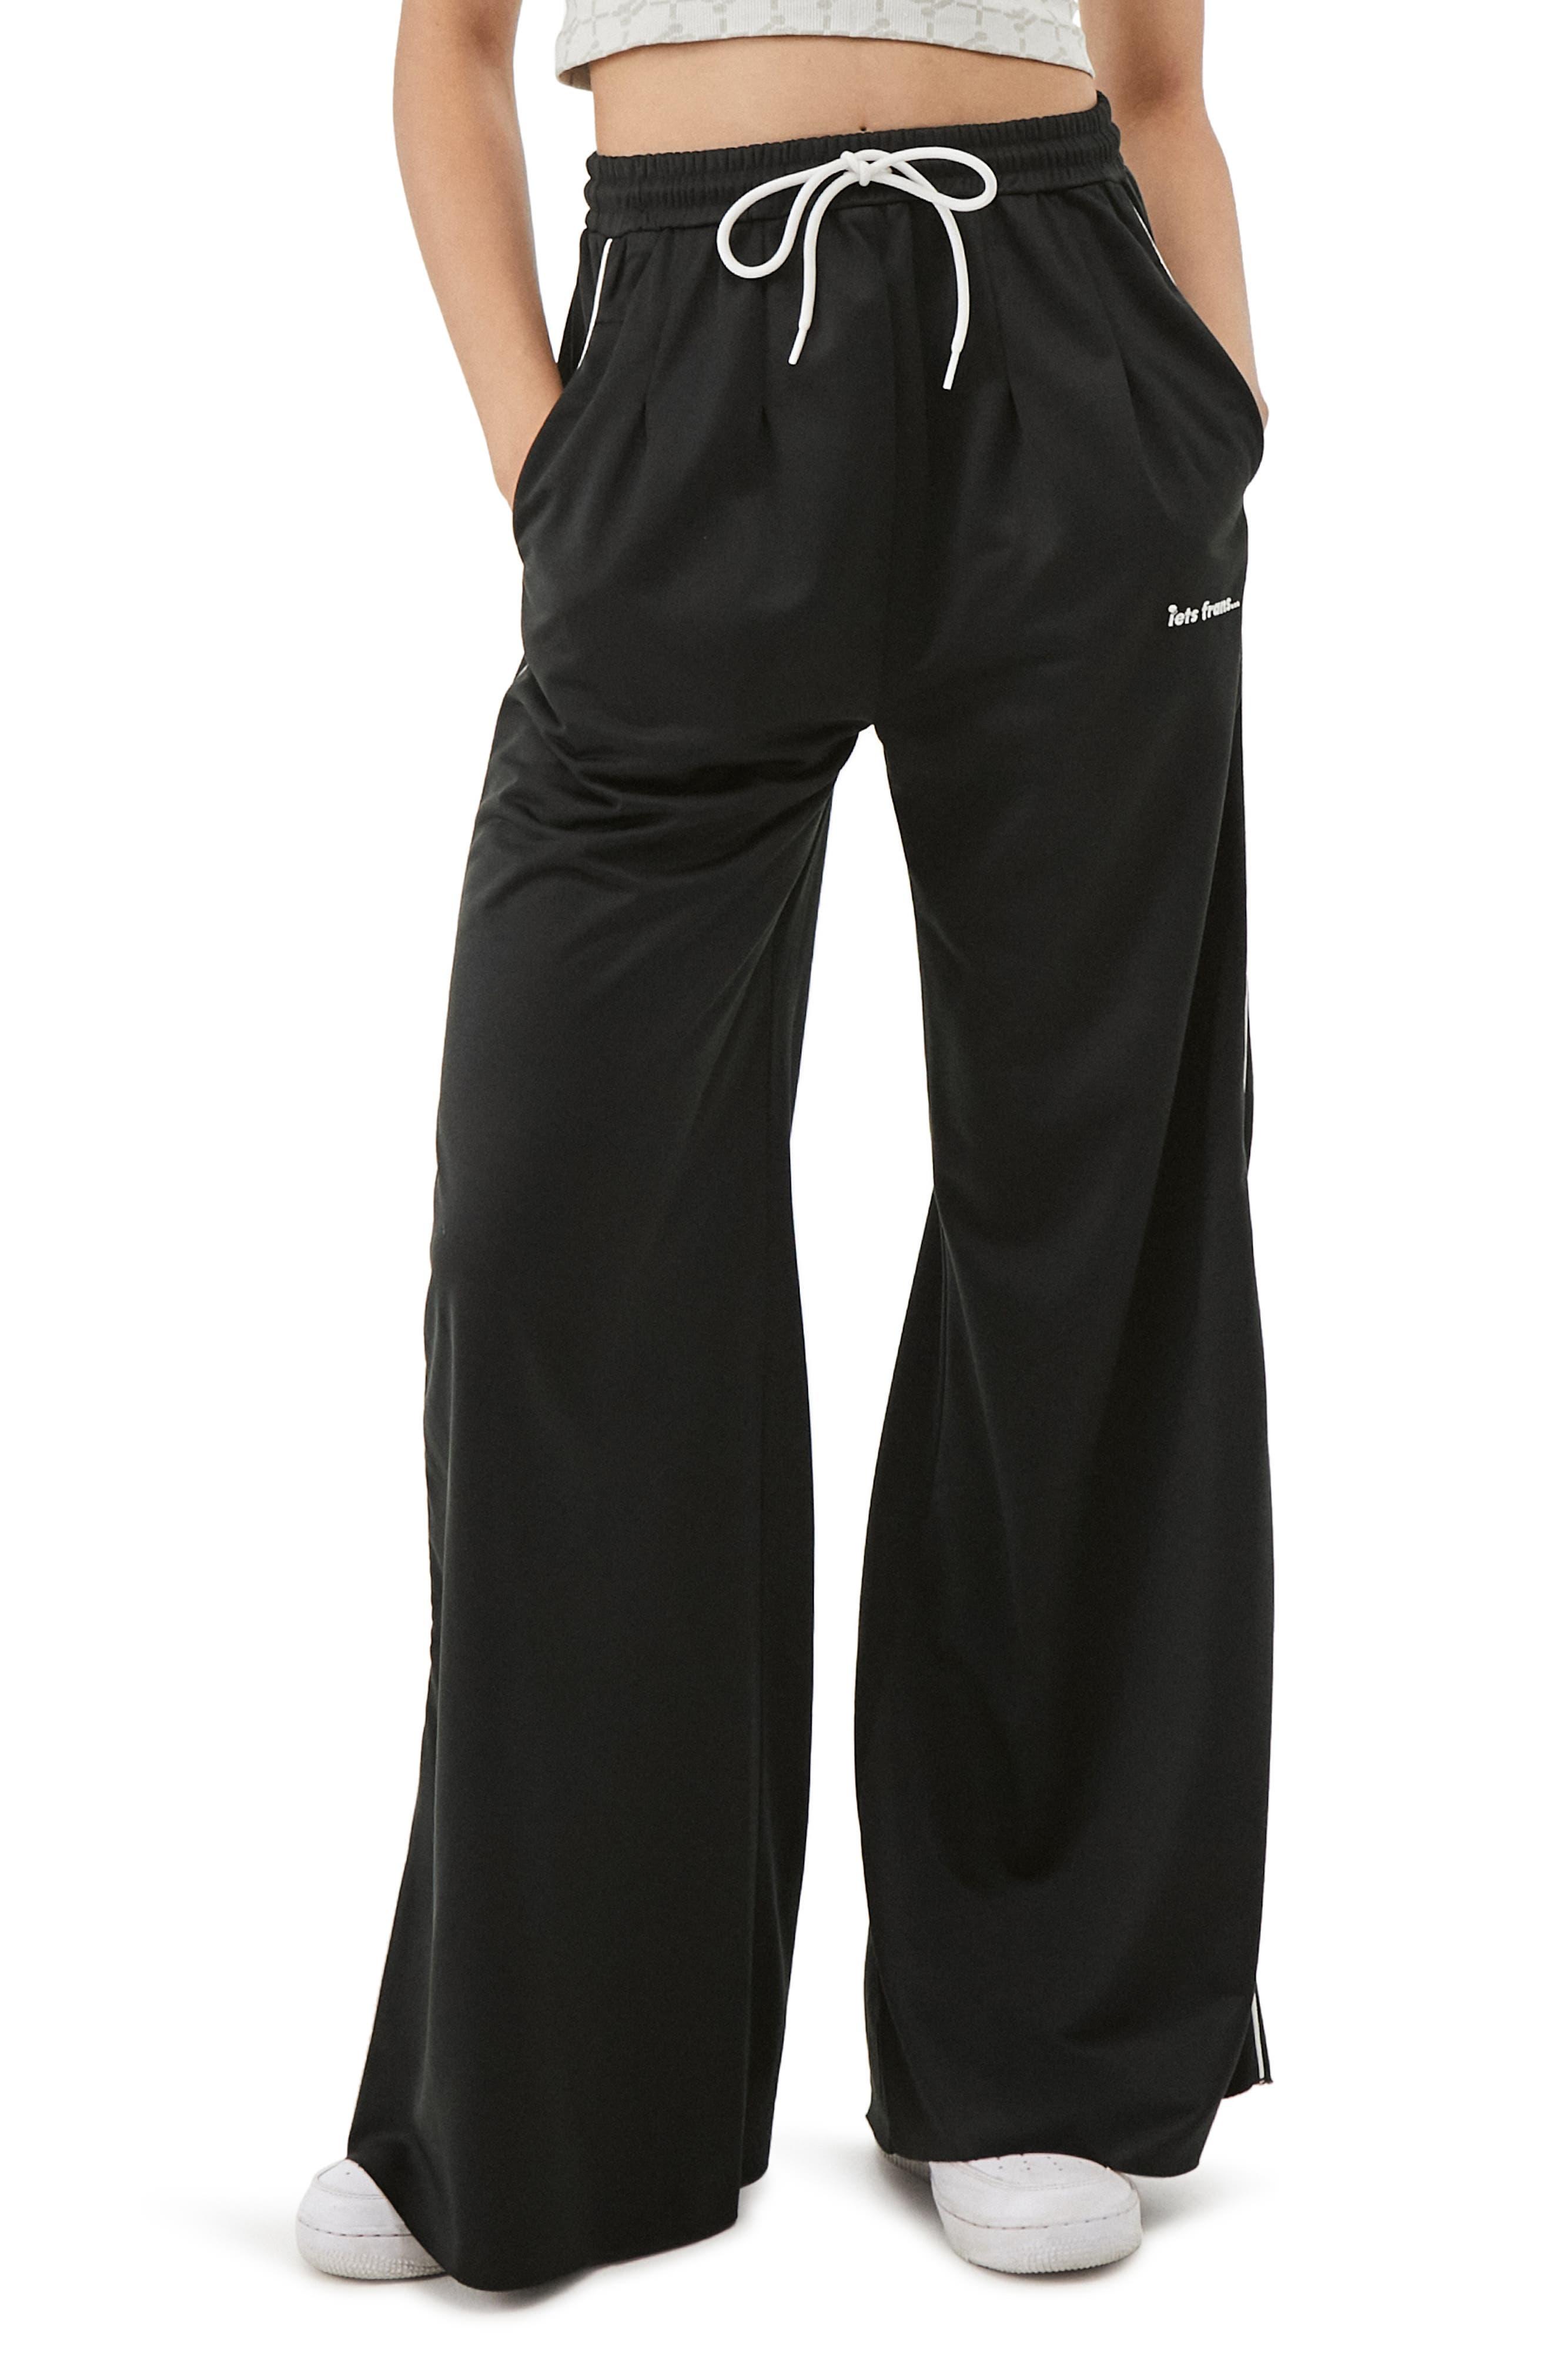 Wide Leg Pocket Joggers